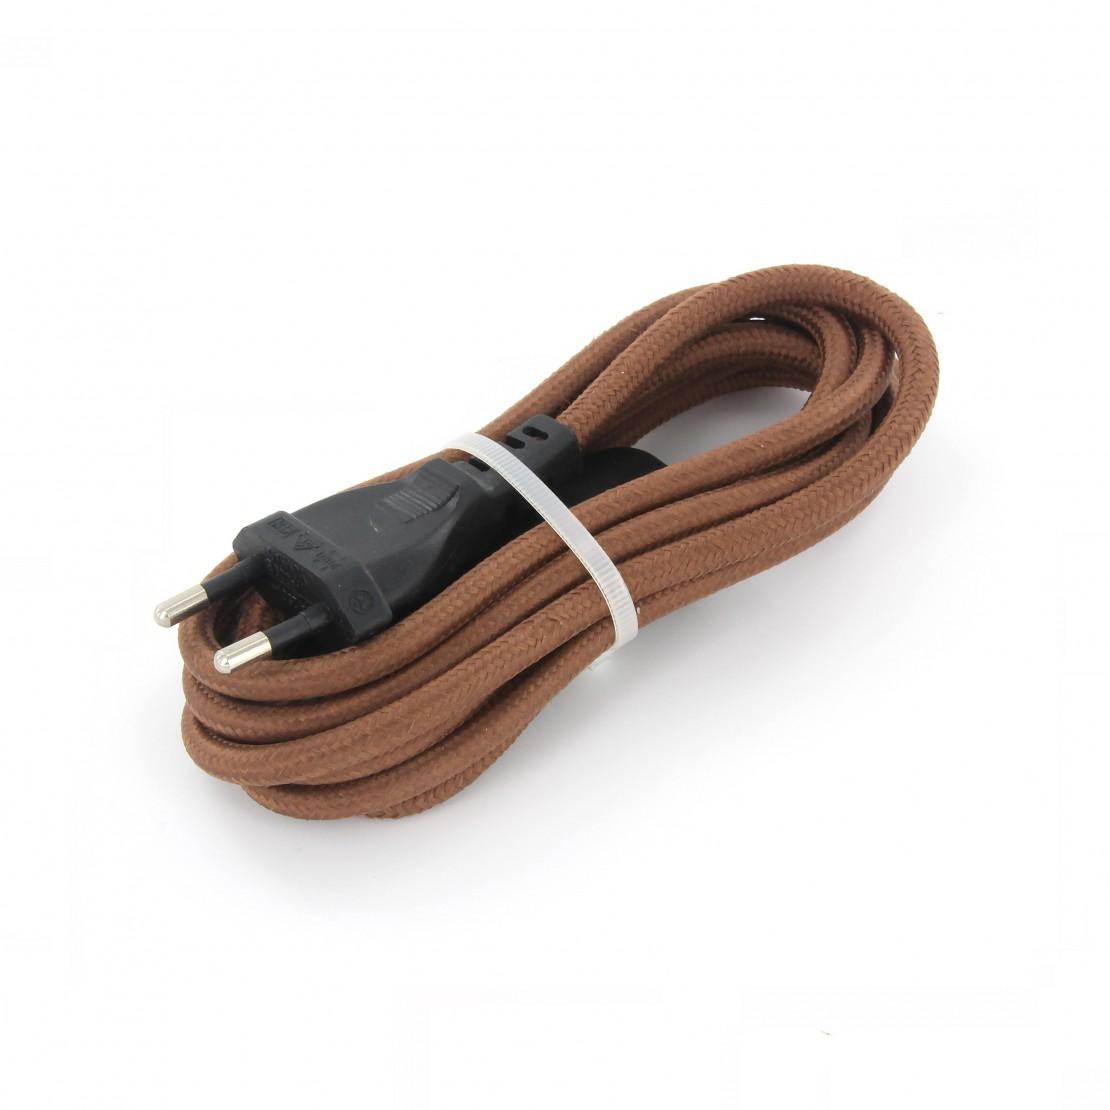 Cables textil con interruptorEHO3VVH2-FE 2 x 0,75mm2 2 m Marron